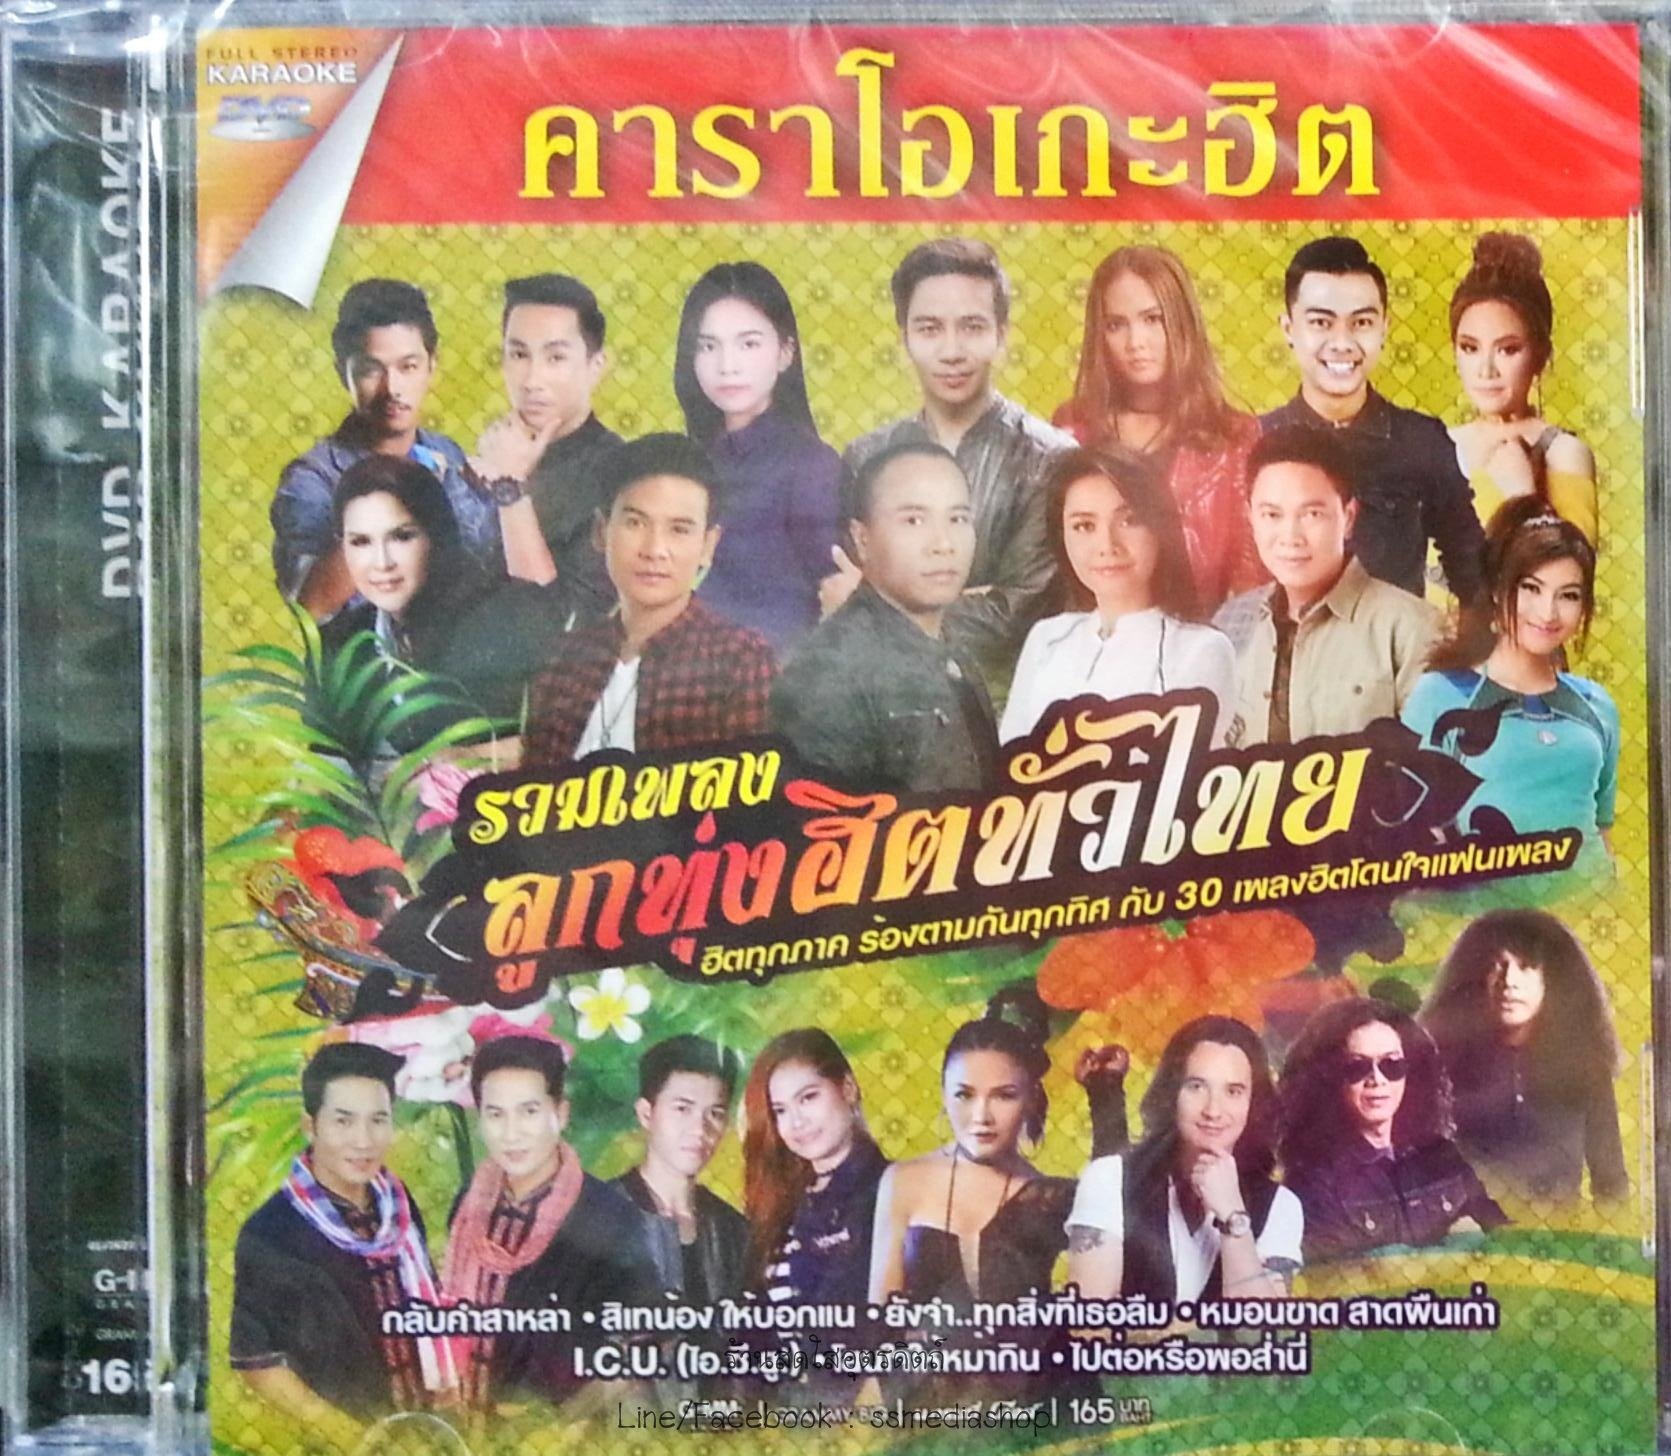 DVD รวมเพลงลูกทุ่งฮิตทั่วไทย